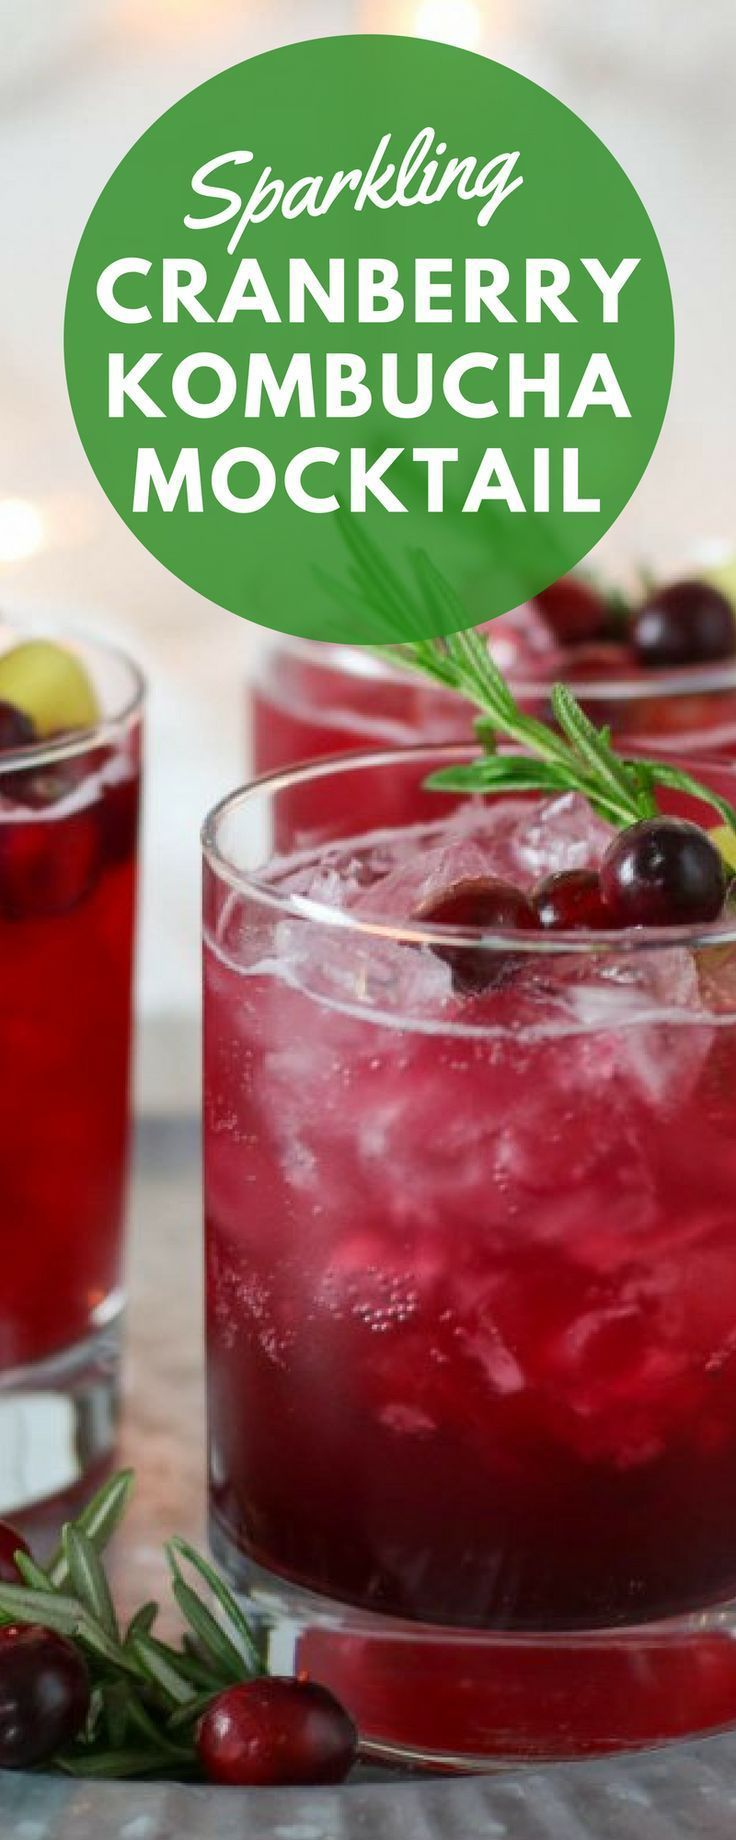 Sparkling Cranberry Kombucha Mocktail Get Healthy U Recipe Cranberry Kombucha Kombucha Healthy Food Swaps